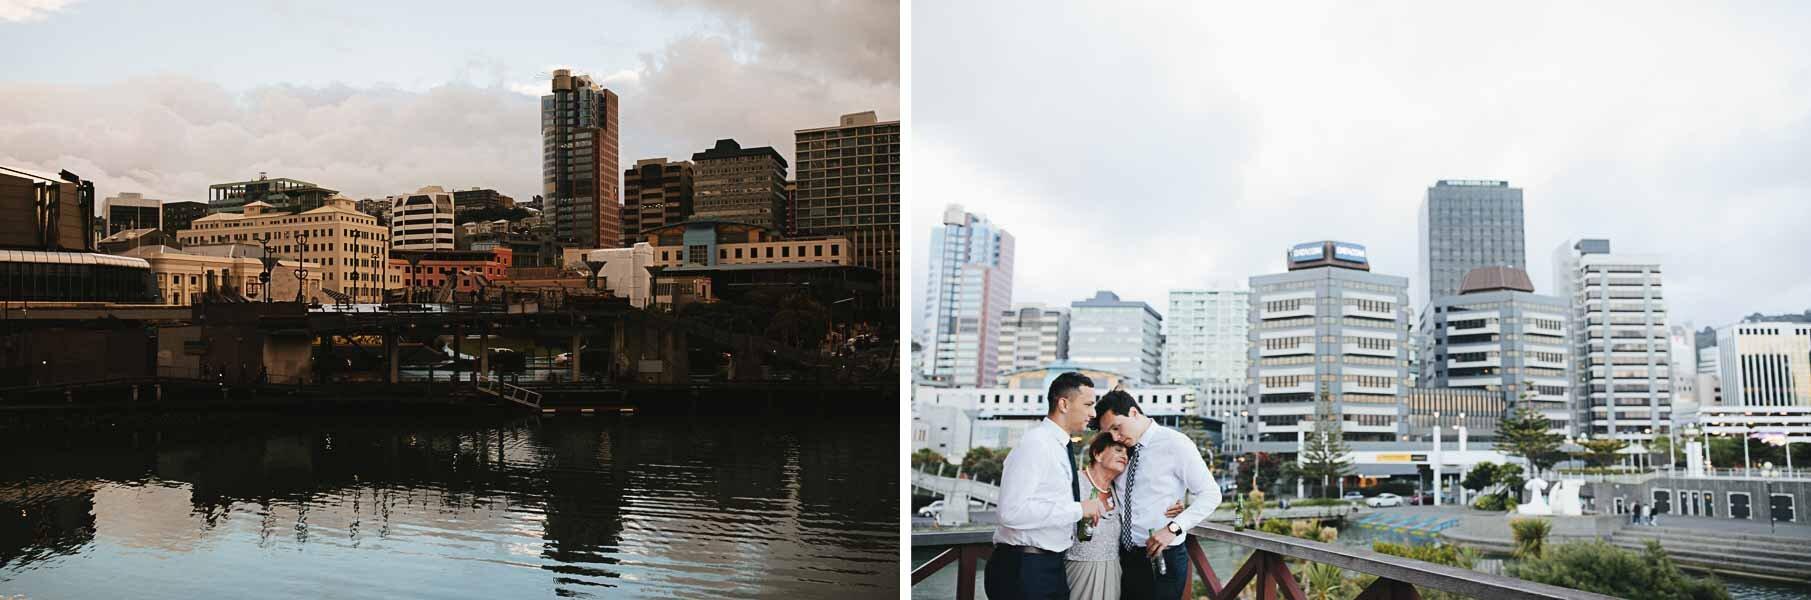 The Boatshed Wedding venue .jpg